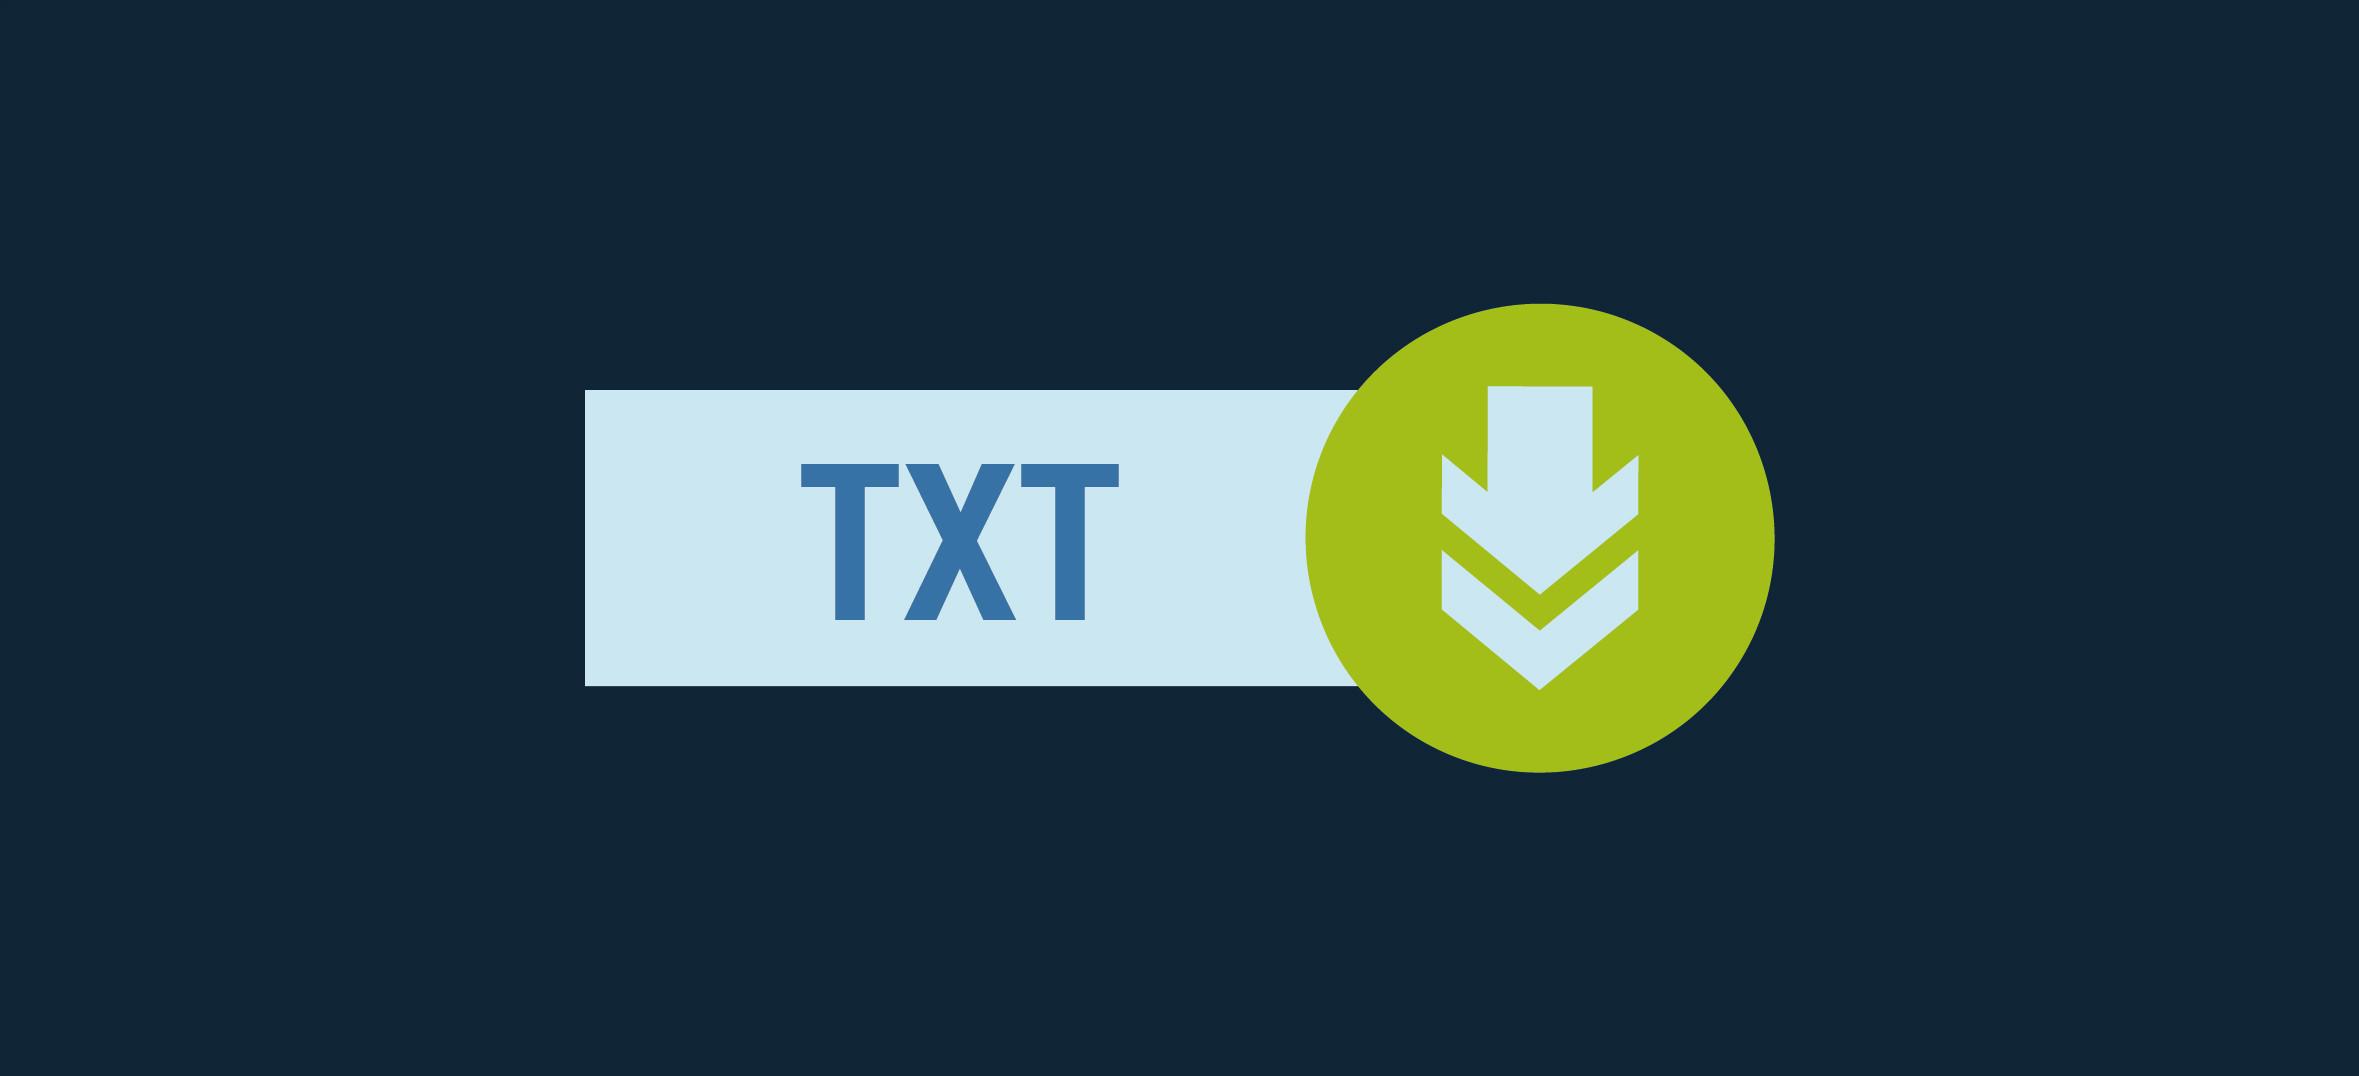 TXT - Release History Notes (Foto © NeuroCheck)